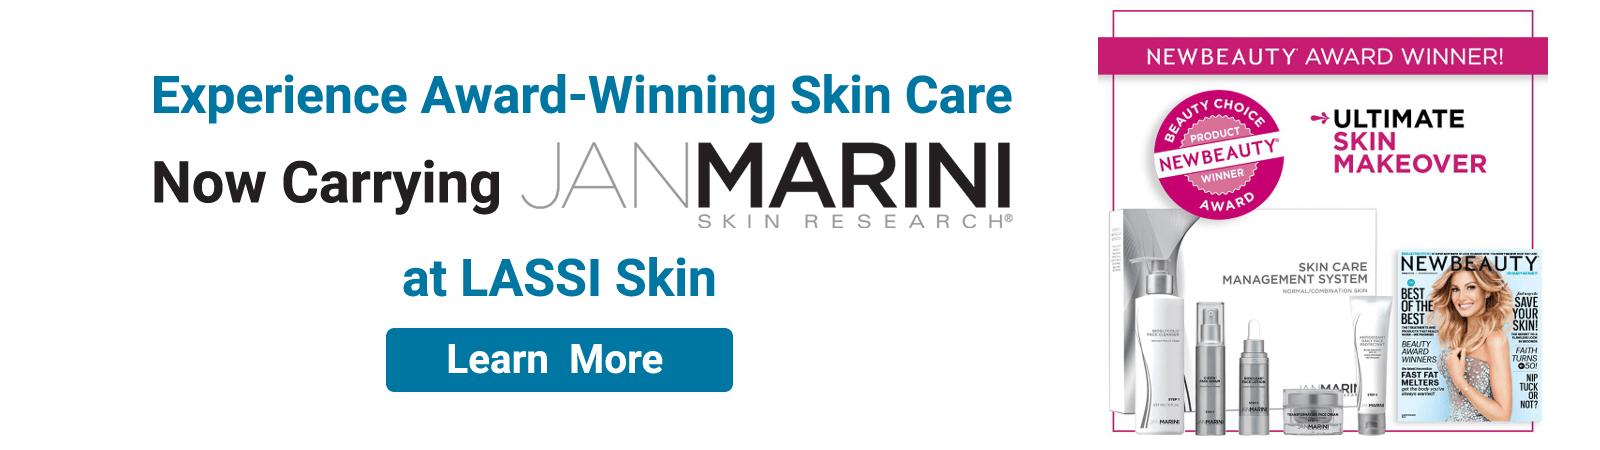 Jan Marini skin care